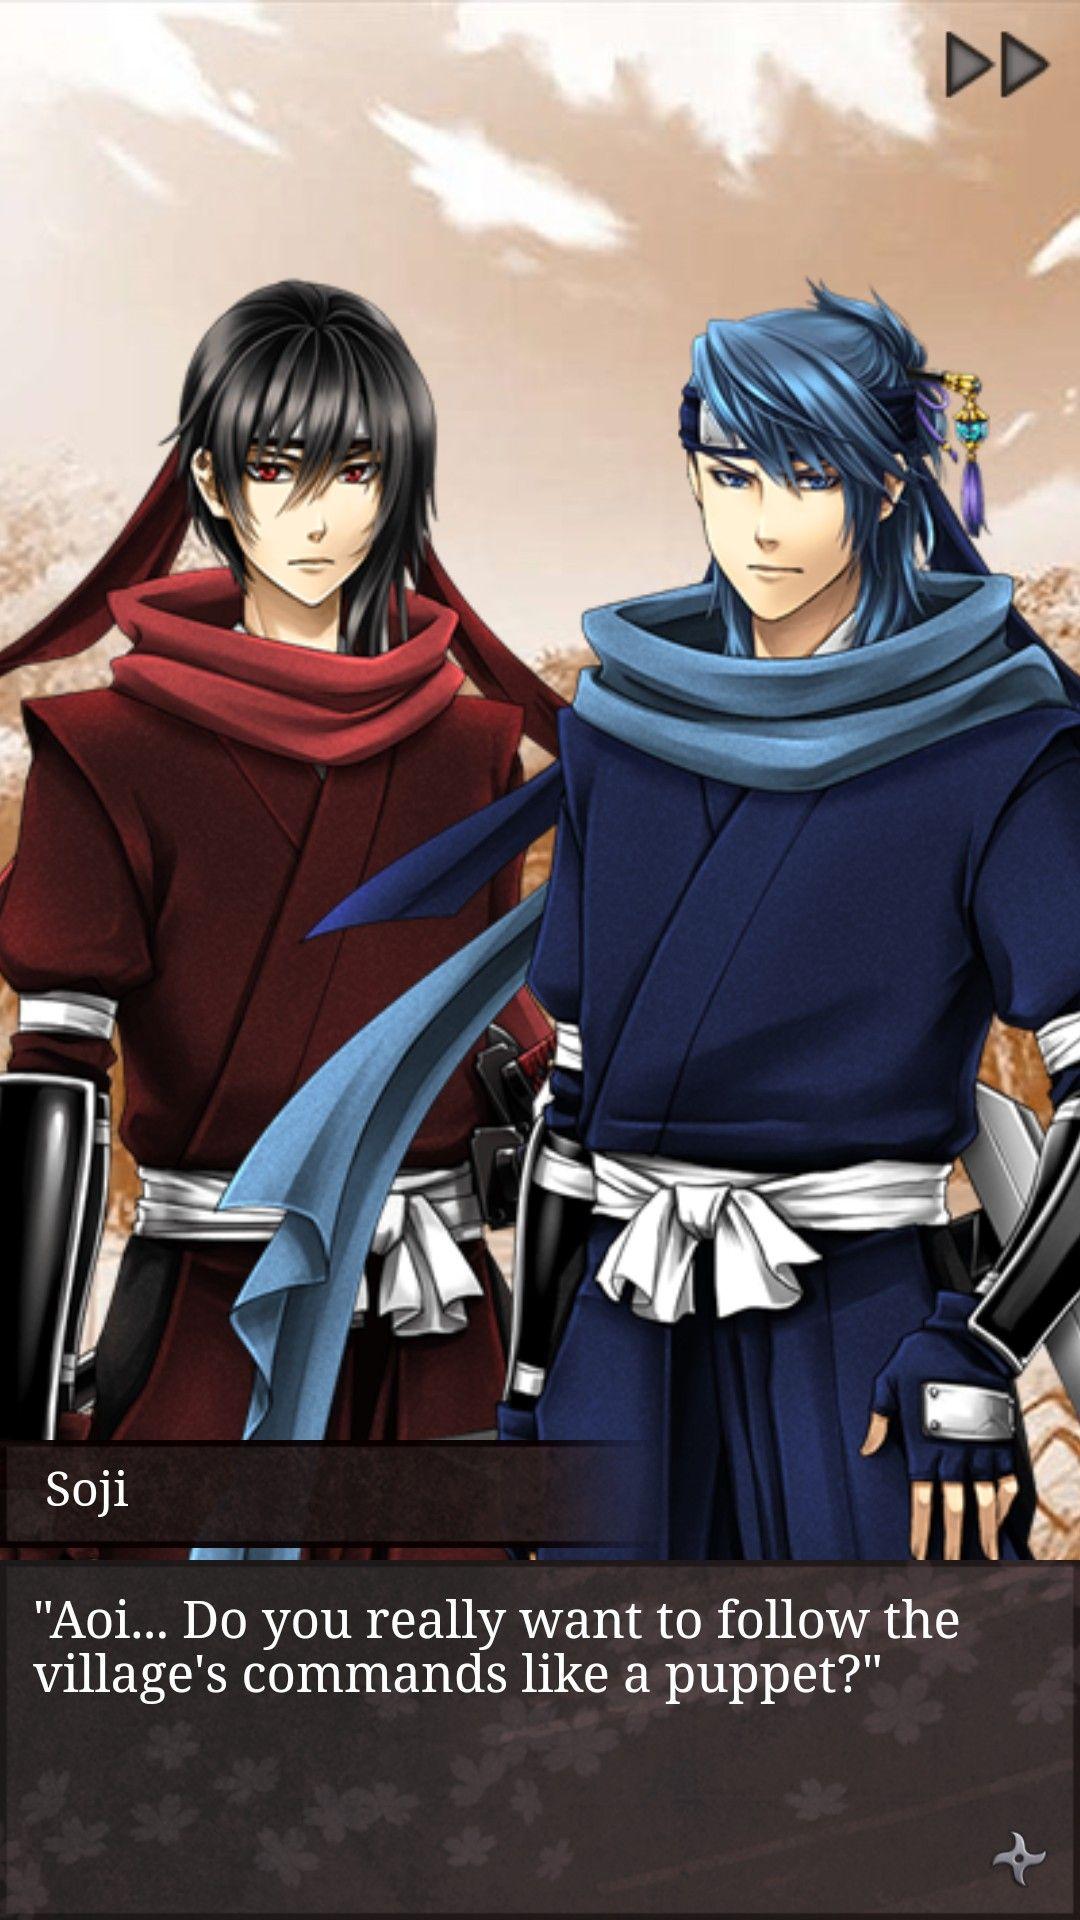 Soji and Aoi... Shall we date ninja assassin + Ninja